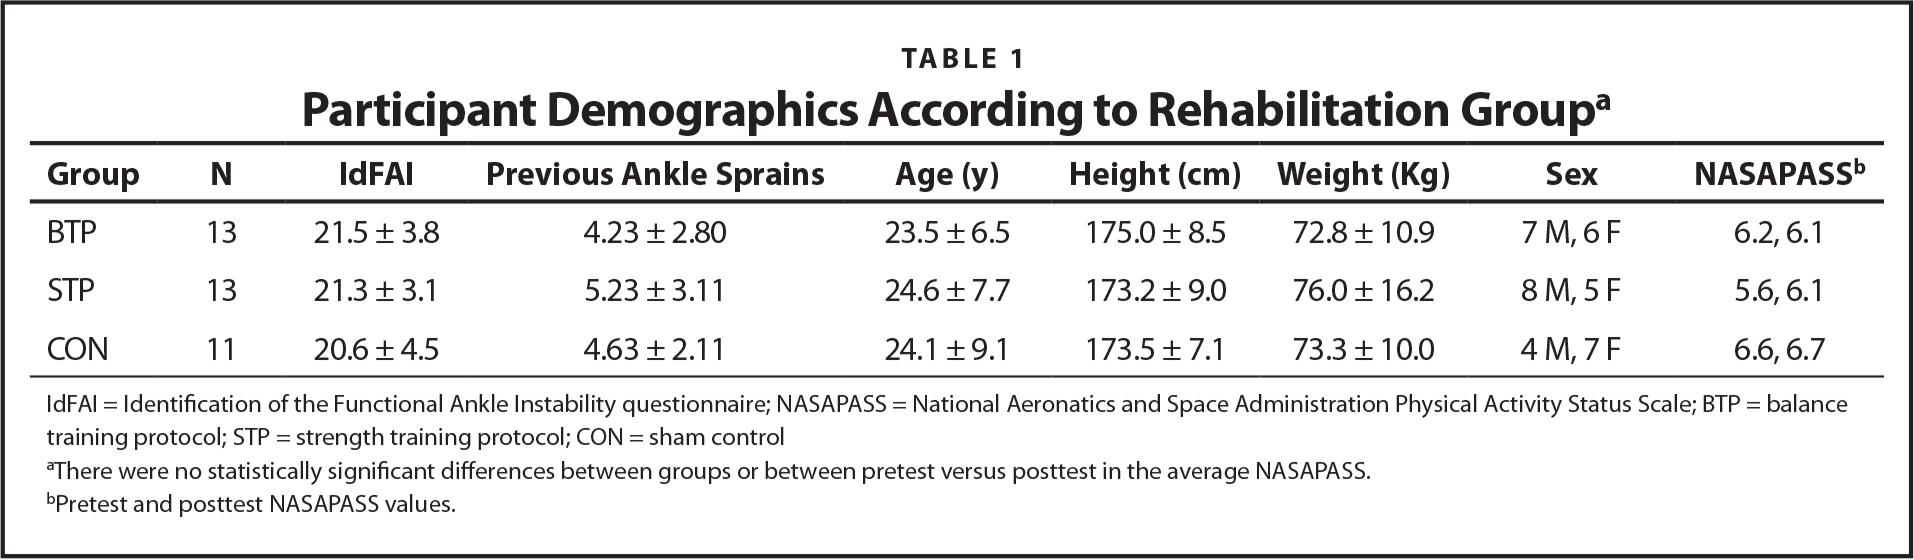 Participant Demographics According to Rehabilitation Groupa